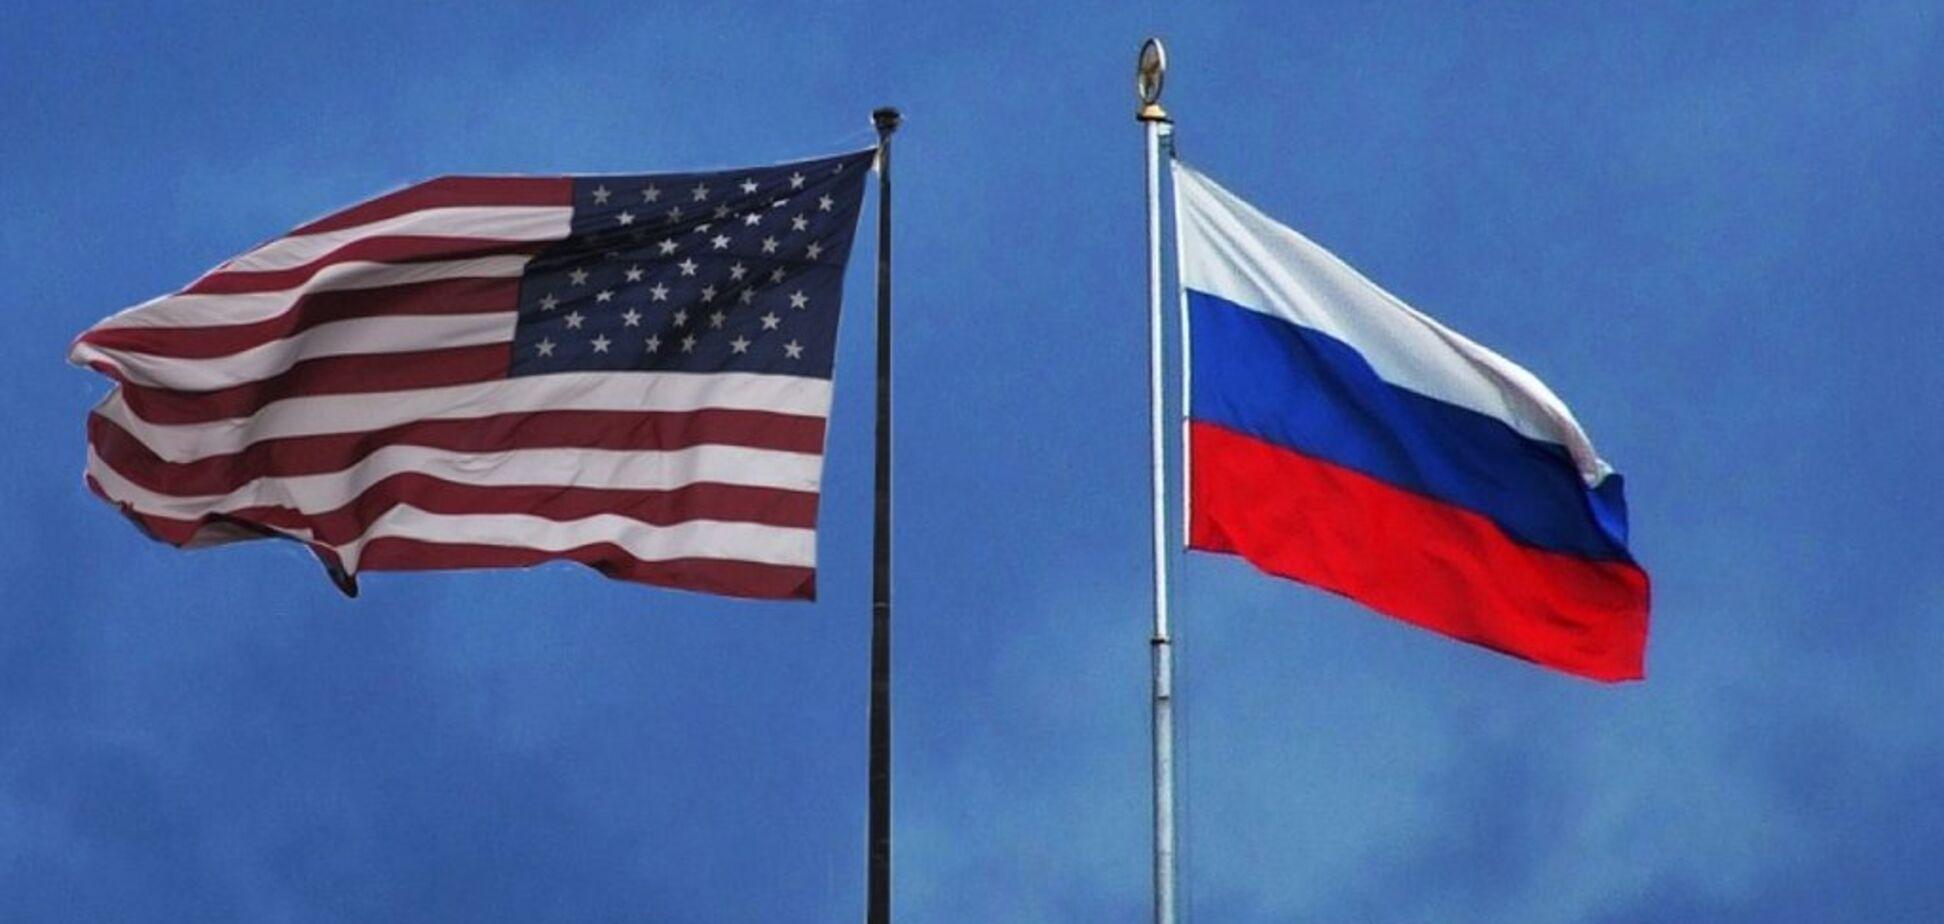 Прапор США і Росії